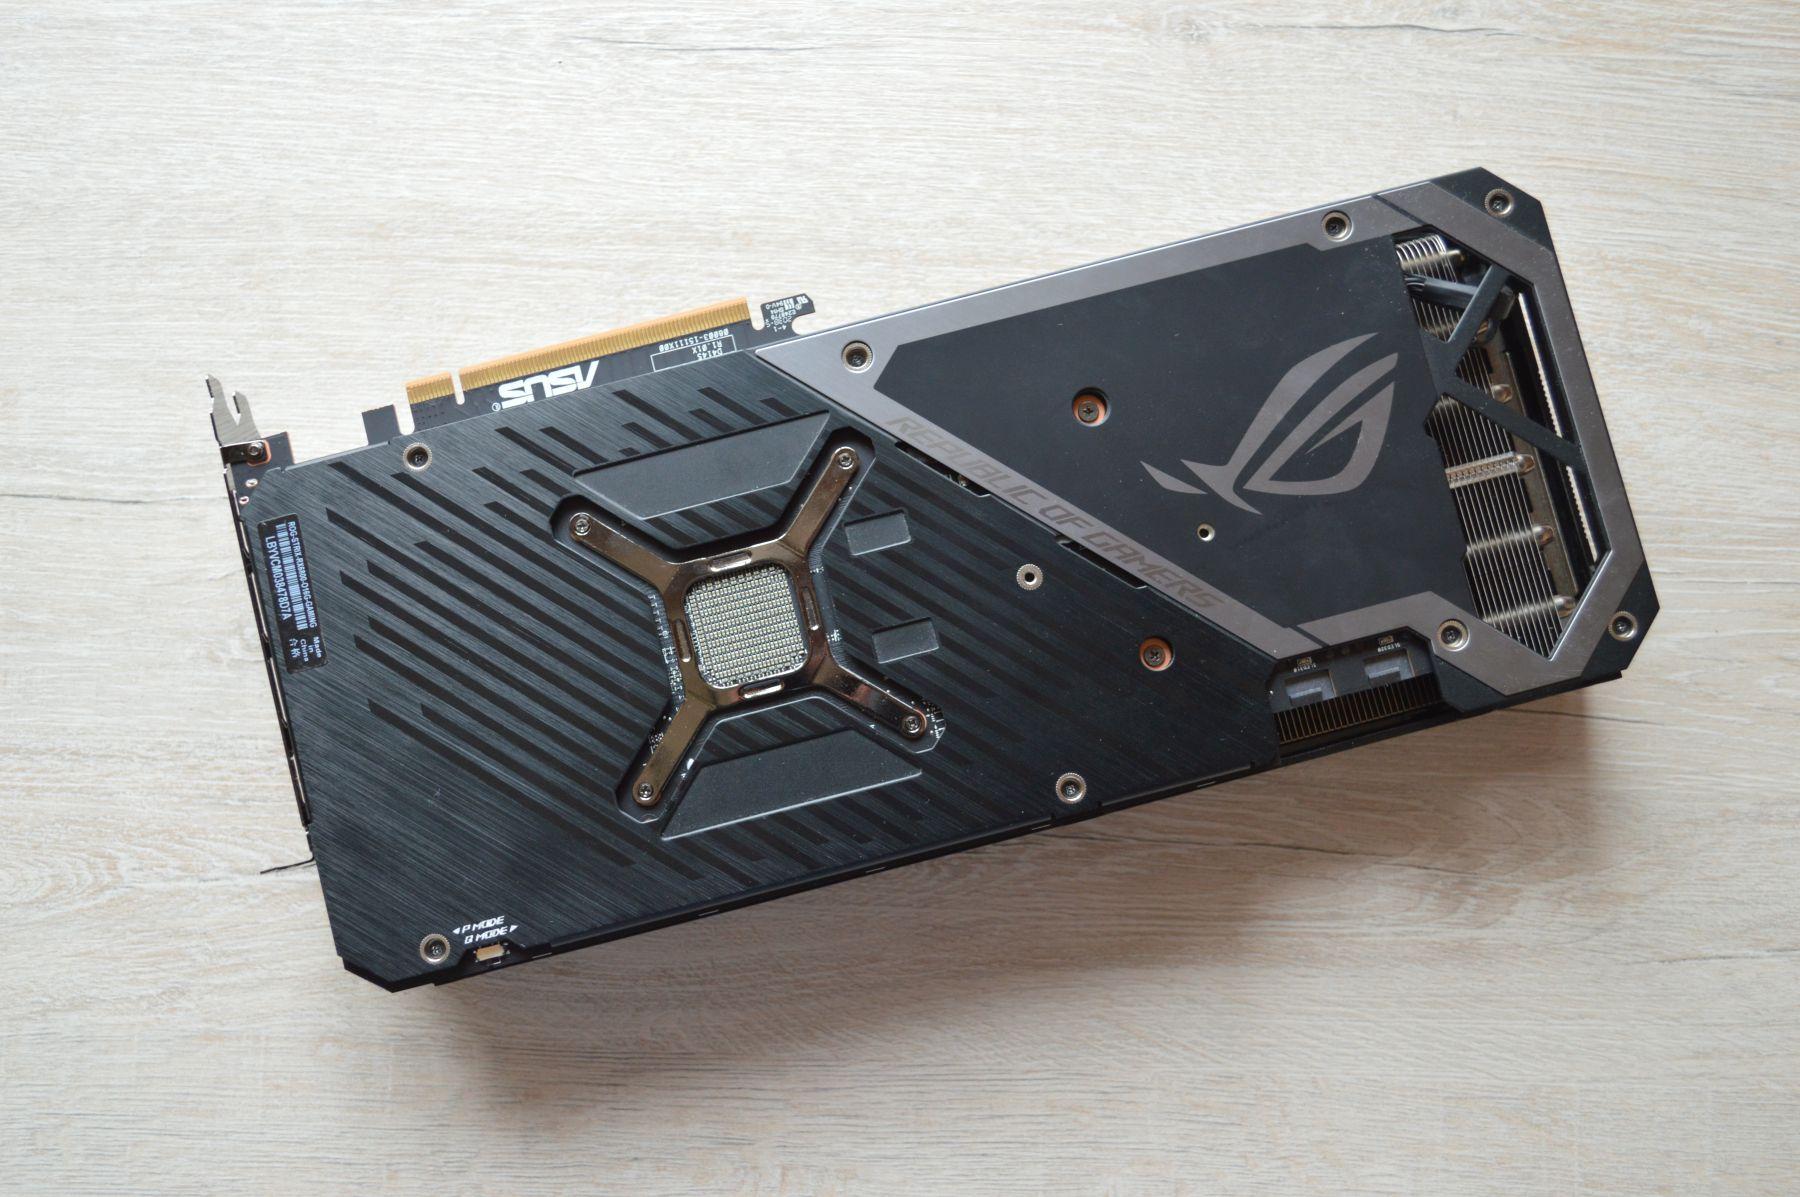 ROG Strix Radeon RX 6800 бэкплейт